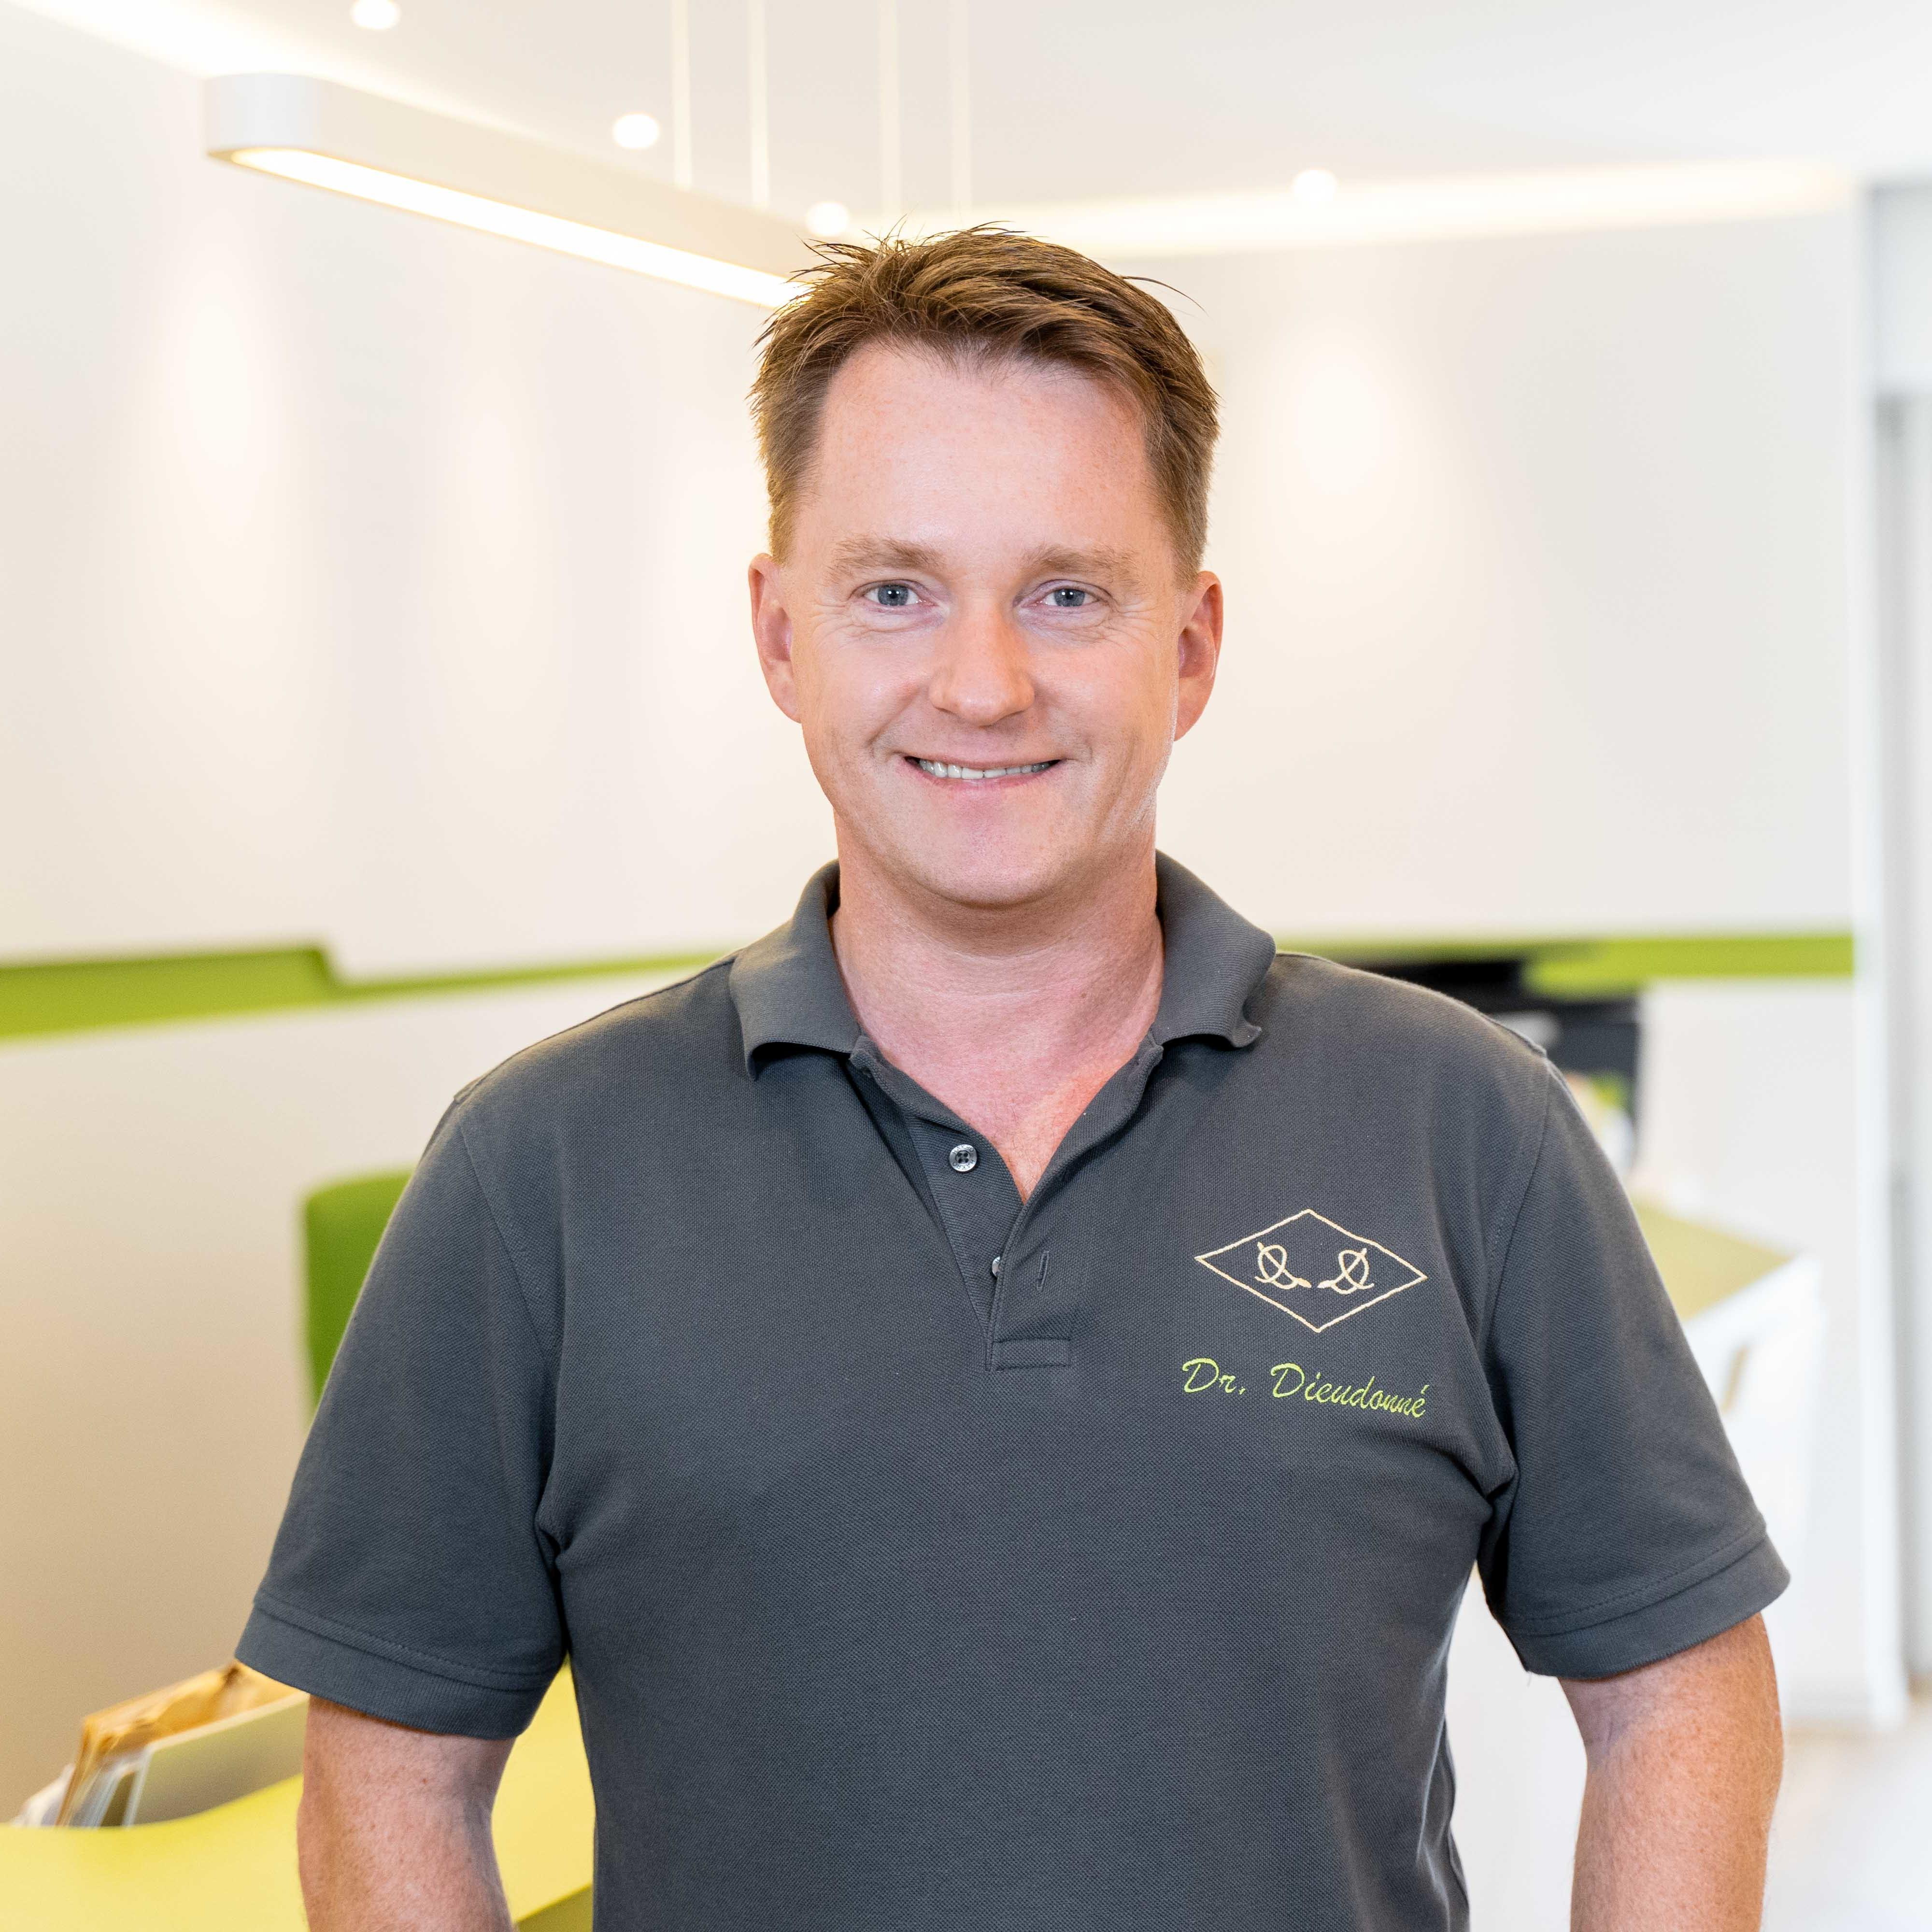 Dr. Dirk Dieudonné, Zahnarzt aus Rüsselsheim